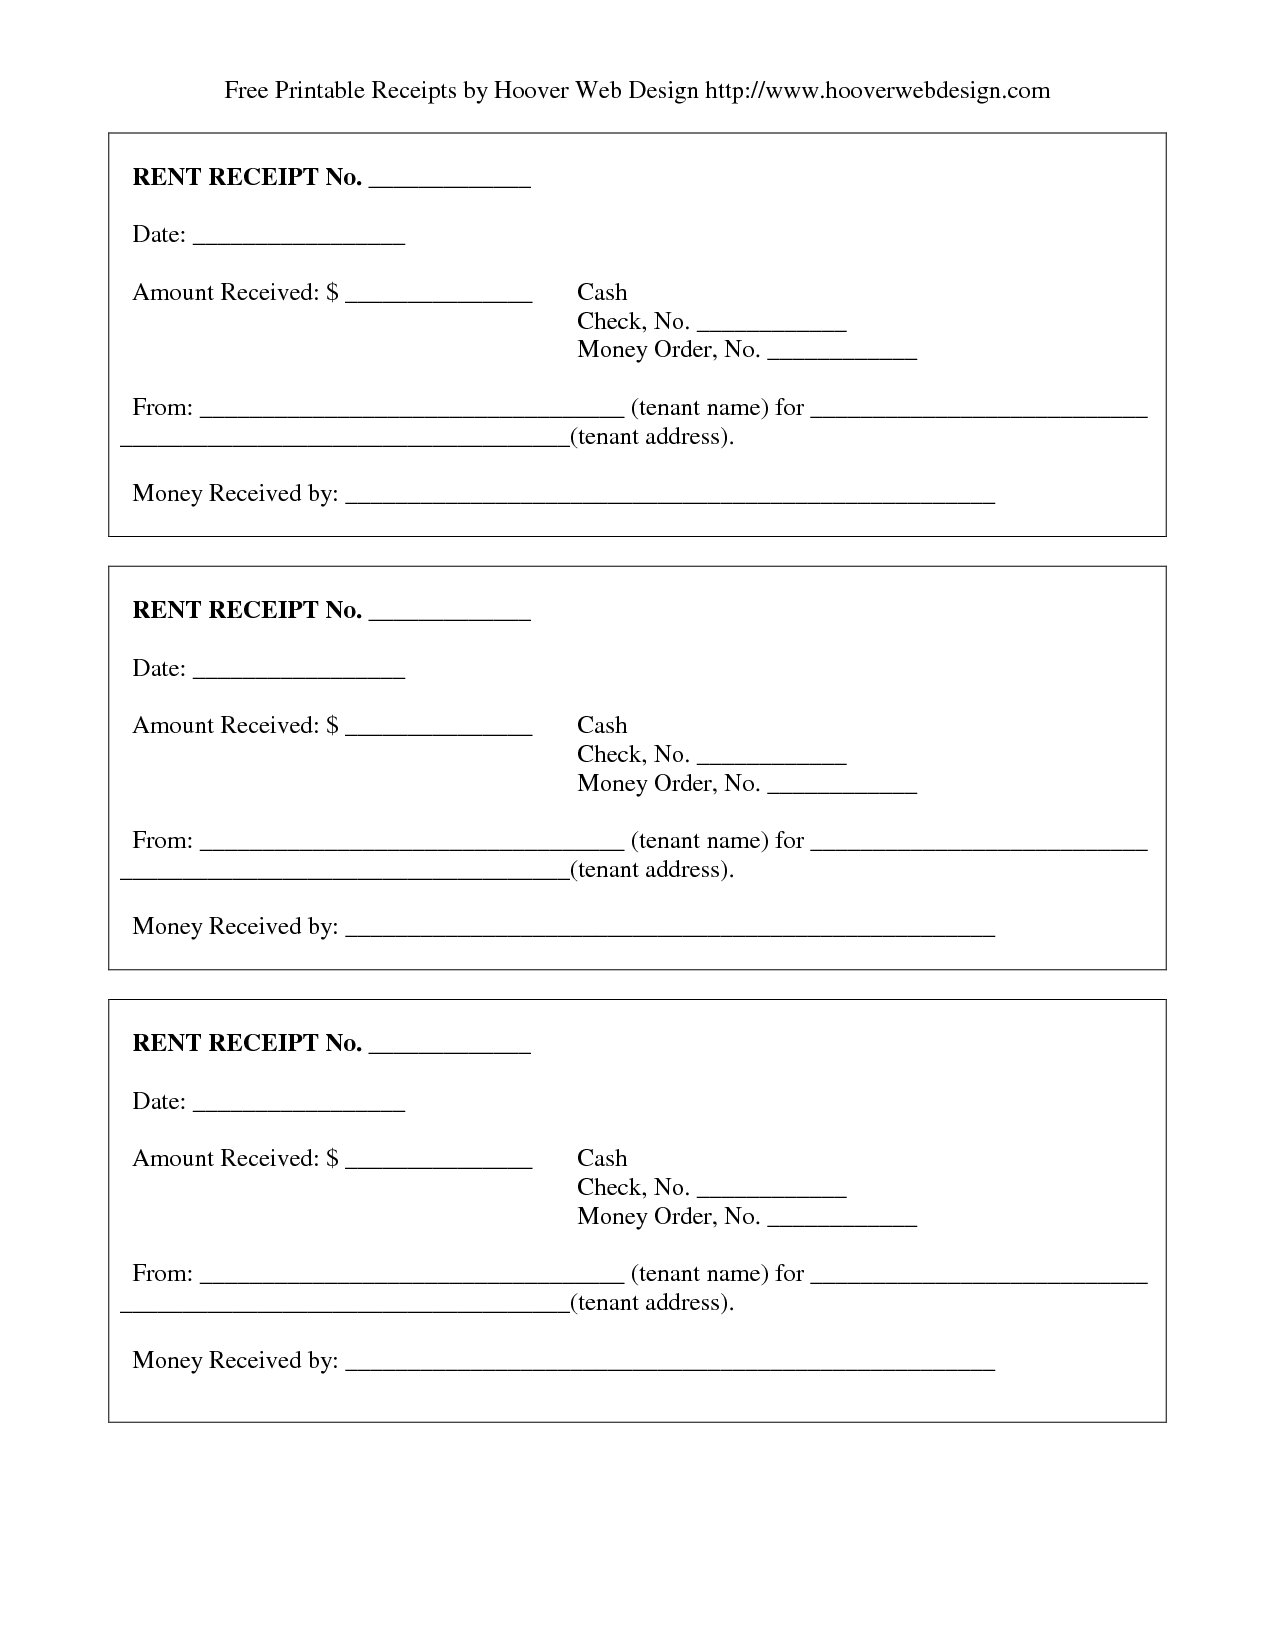 Printable Rent Receipt Printable Editable Blank Calendar 2017 – Printable Rent Receipt